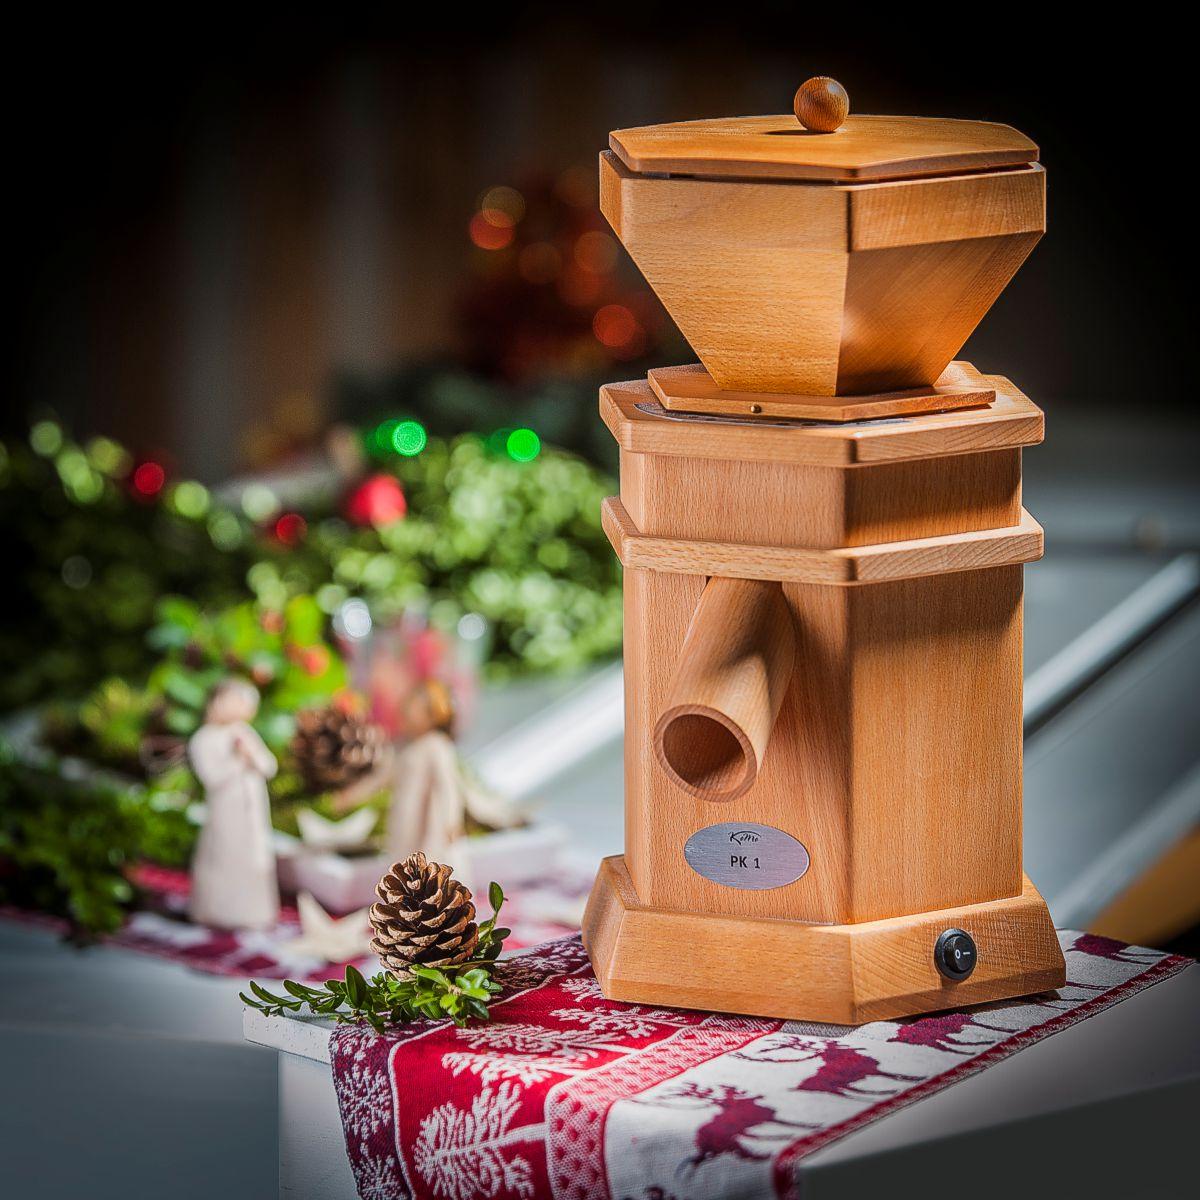 Komo_Christmas_PK1_1200